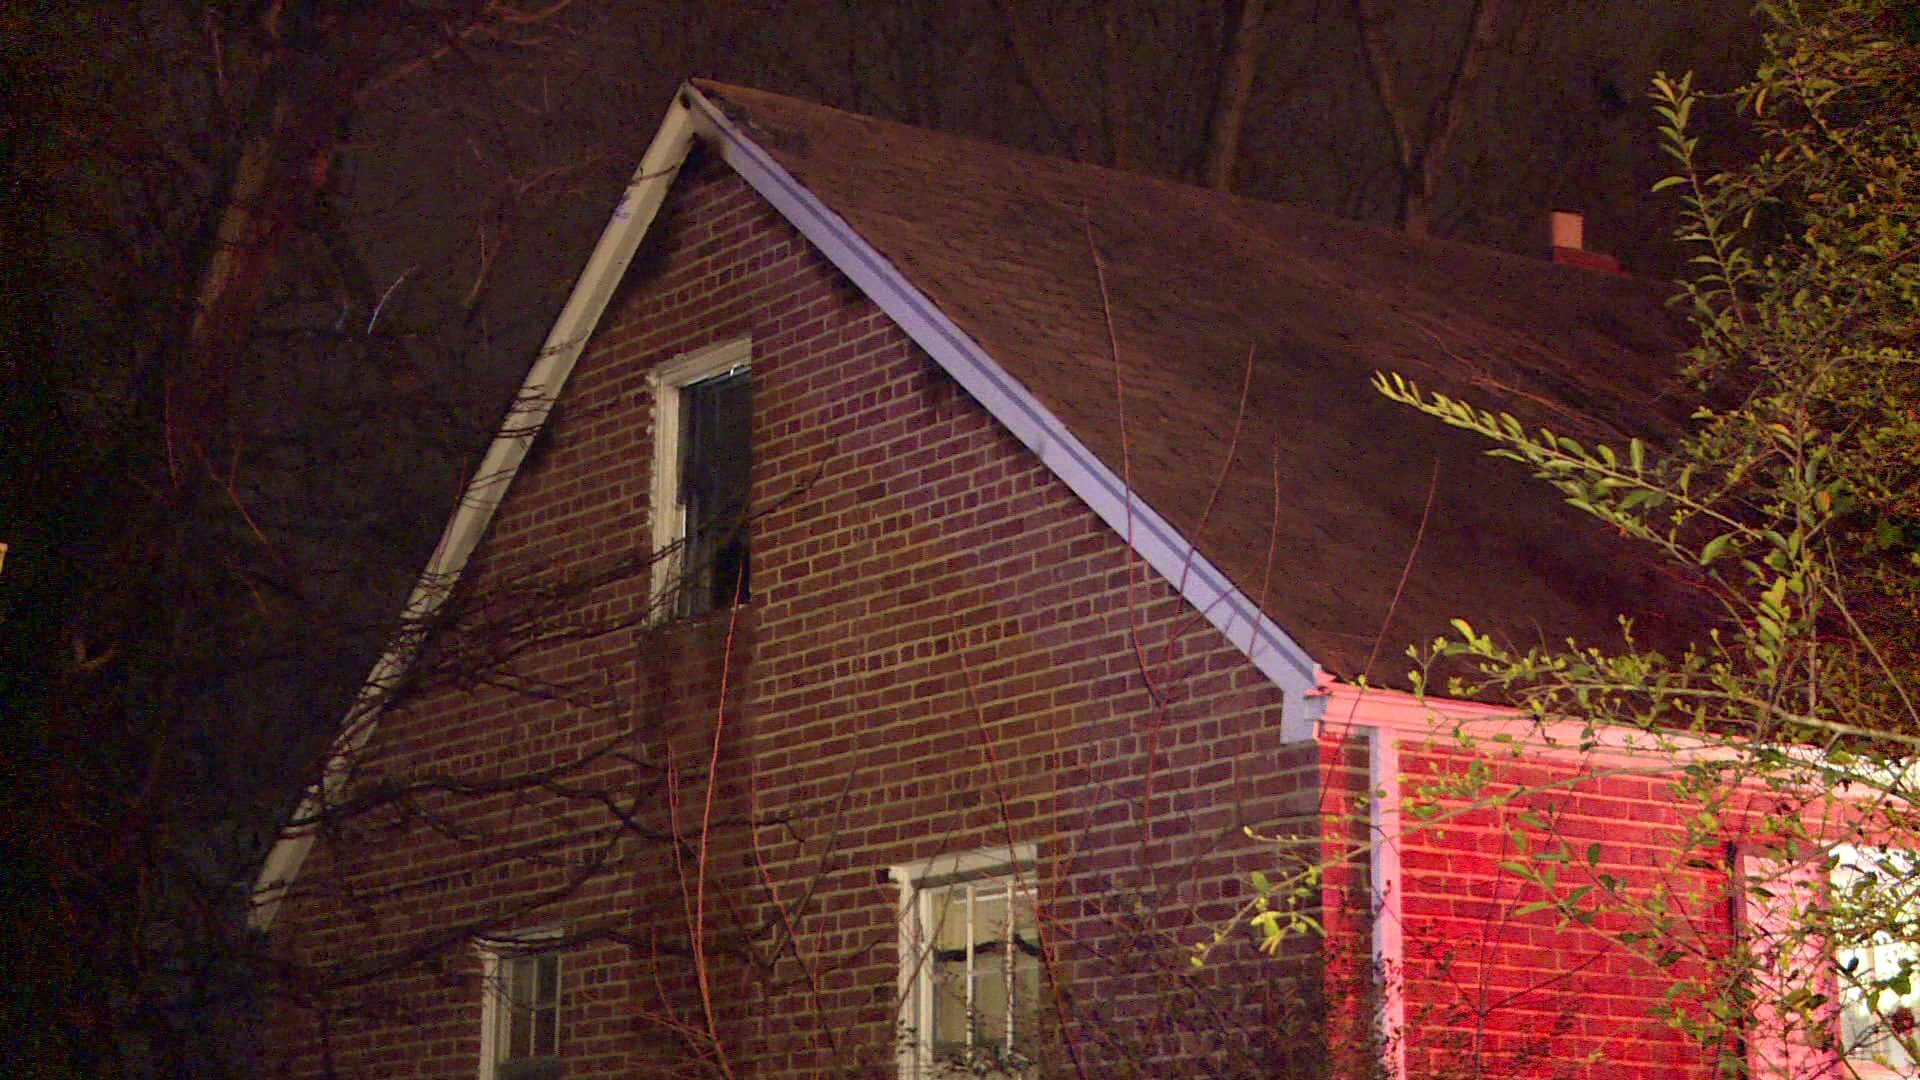 Photos: Firefighter injured in Bellemeade housefire